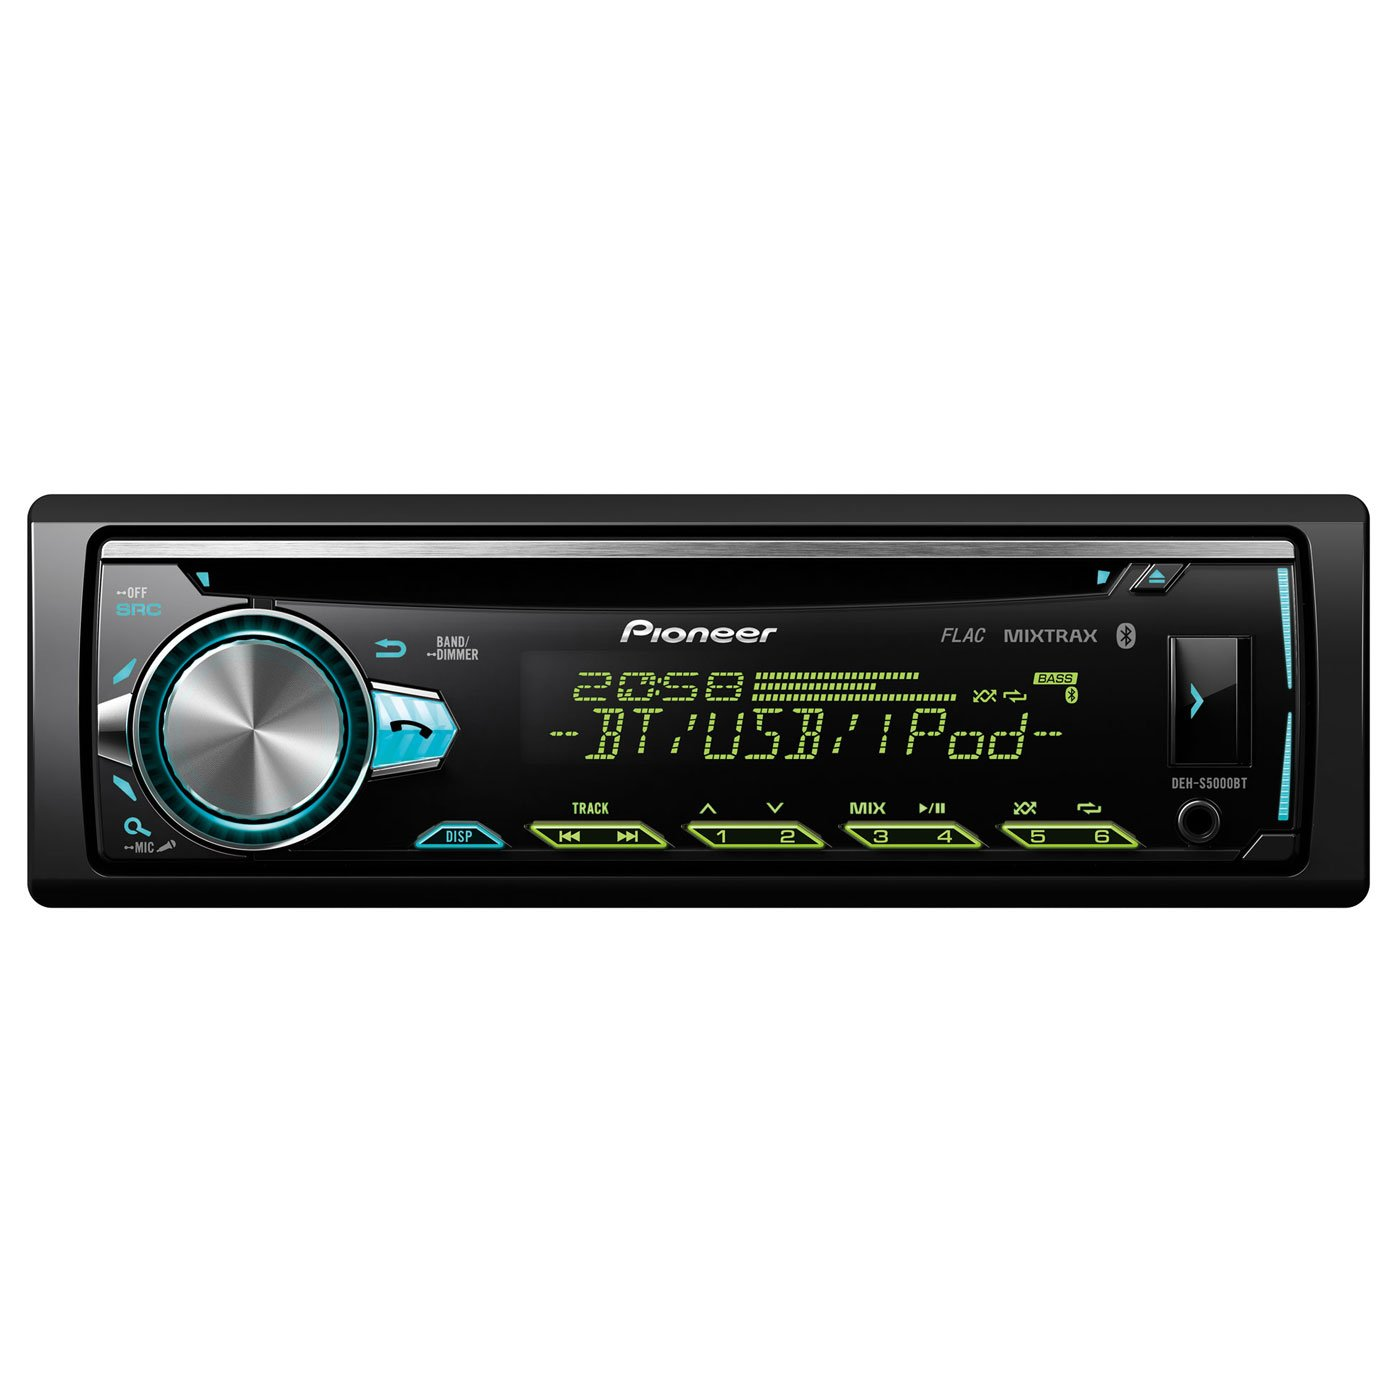 Pioneer DEH-S5000BT | 1DIN Autoradio | CD-Tuner mit RDS | Bluetooth | MP3 |  USB | AUX-Eingang | Bluetooth Freisprecheinrichtung | Multi-Color Tastenbeleuchtung | ARC | Karaoke Mic Mixing | Spotify